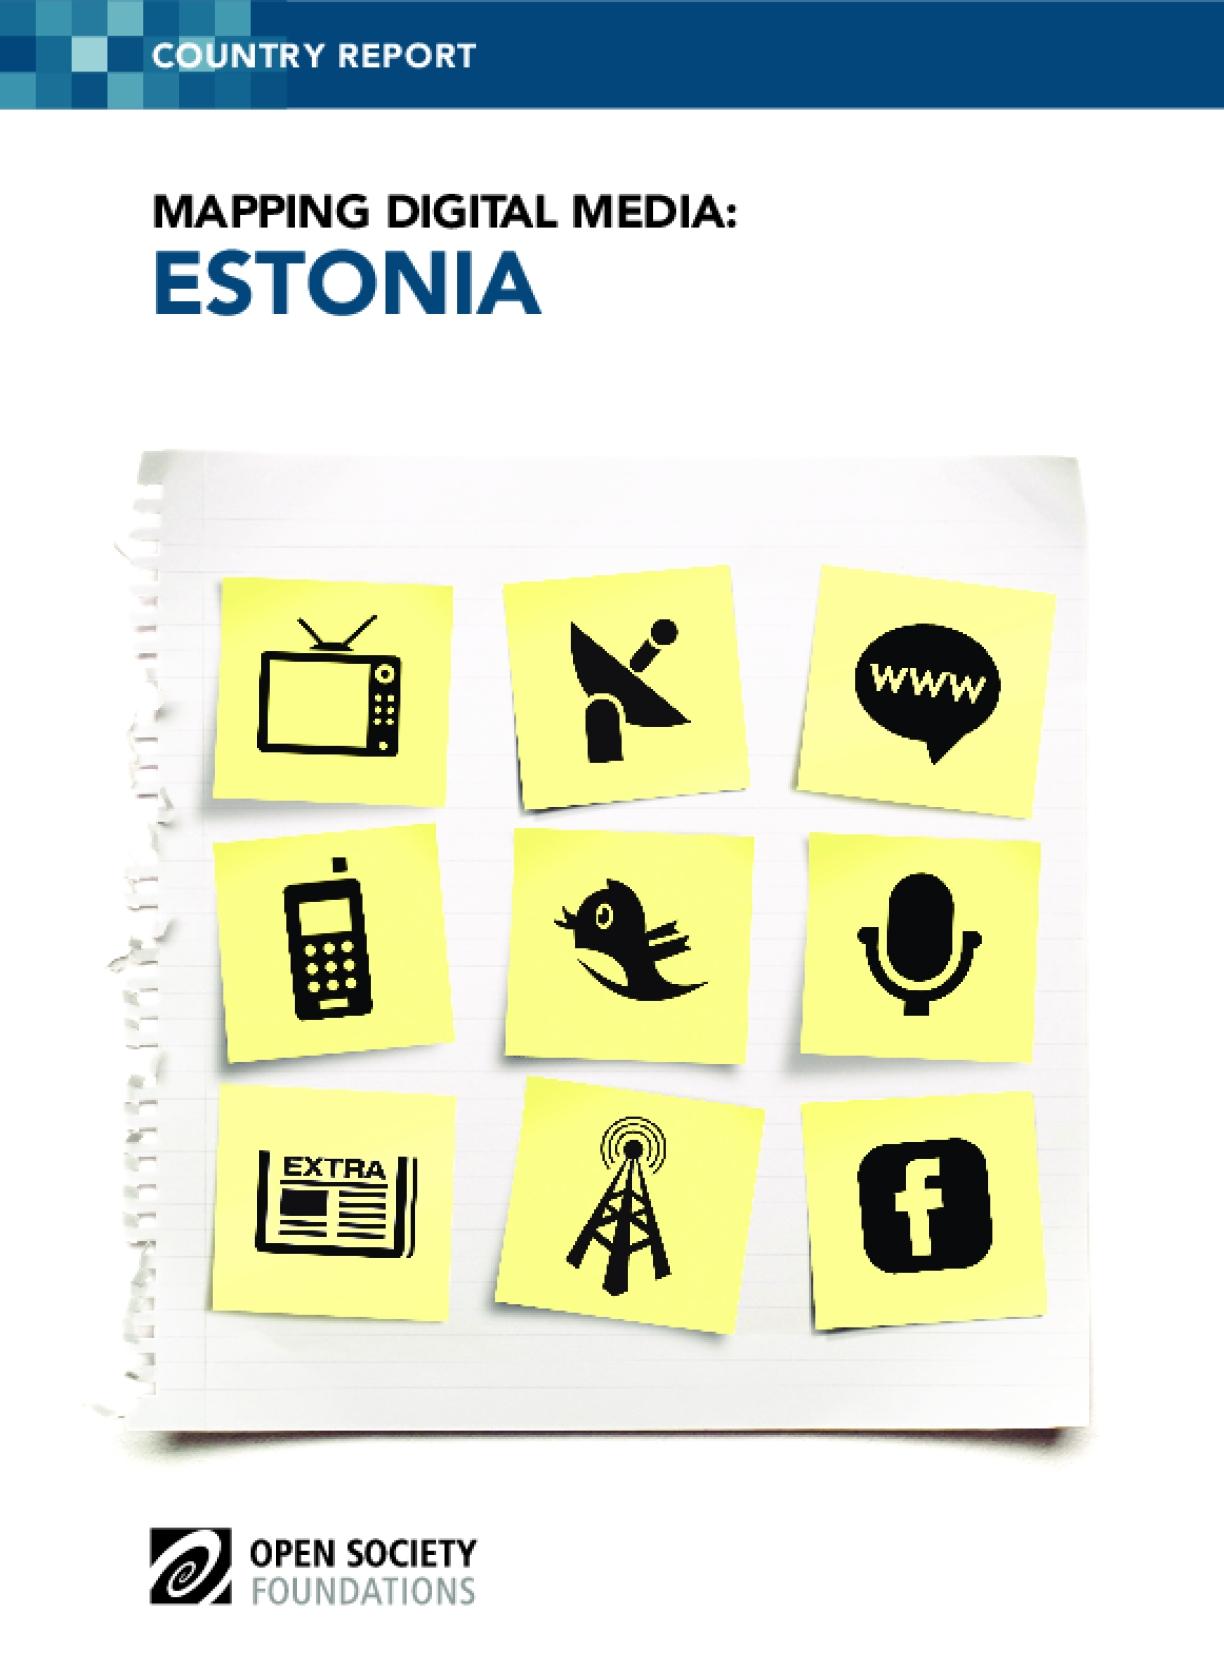 Mapping Digital Media: Estonia